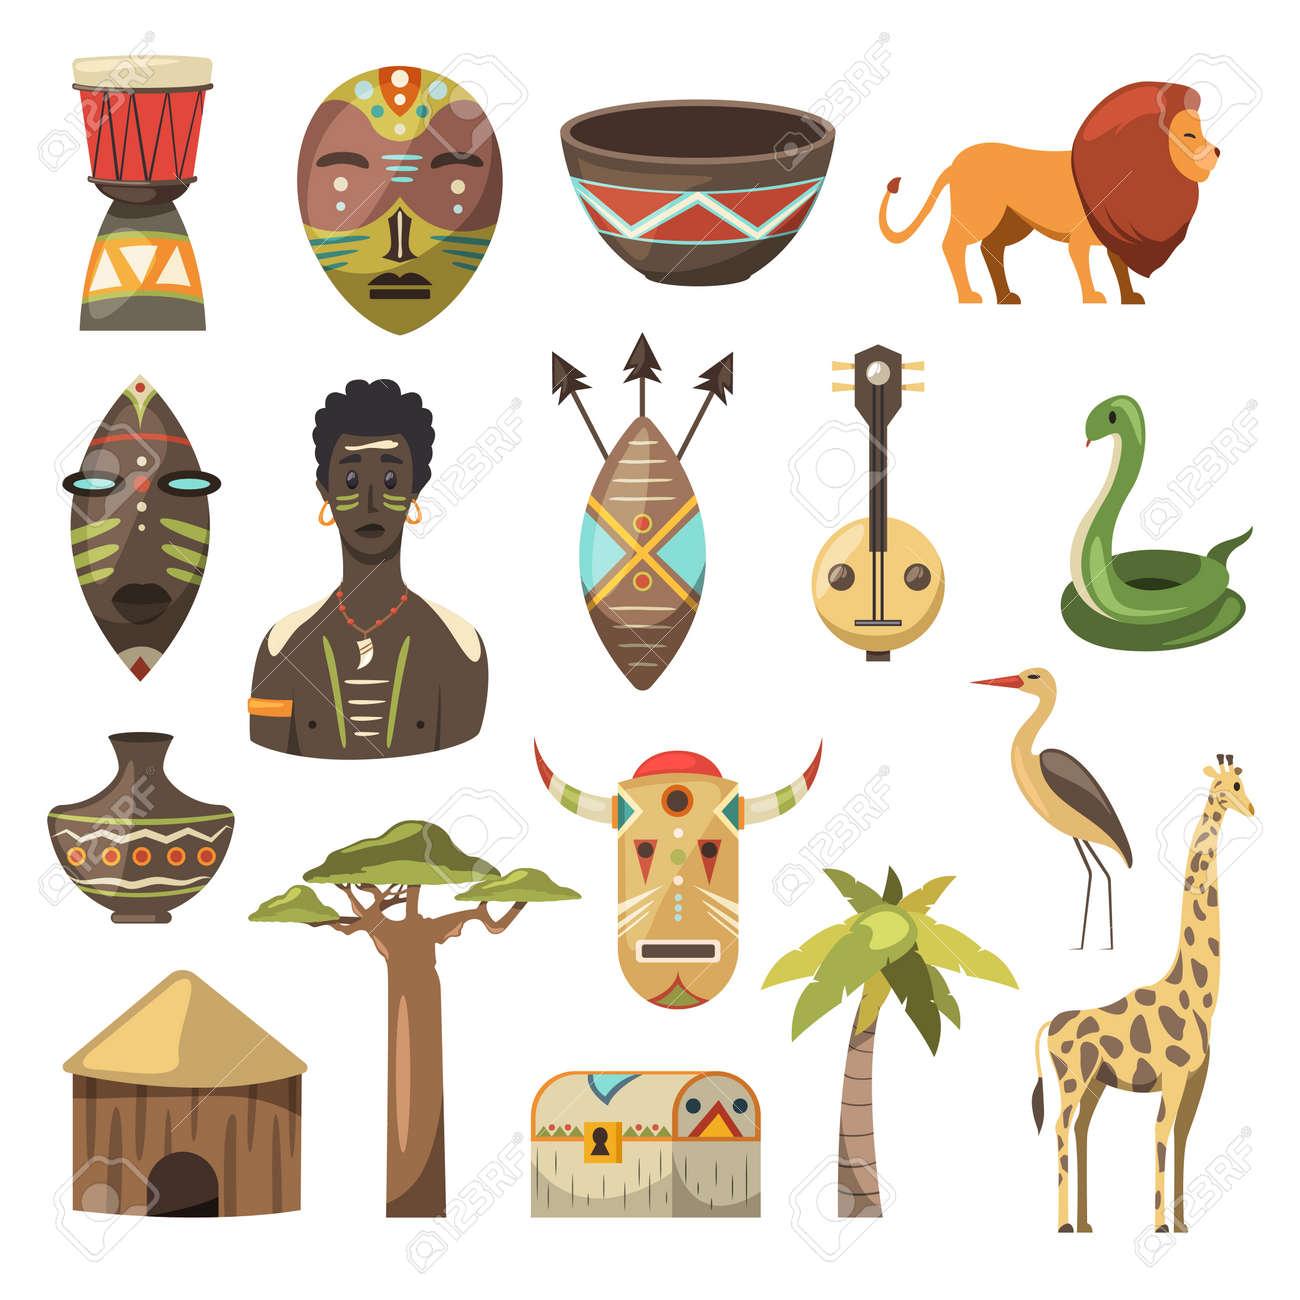 Africa. African images. Vector icons. Giraffe, mask, man, snake, vase, lion, house, palm, baobab - 97041843